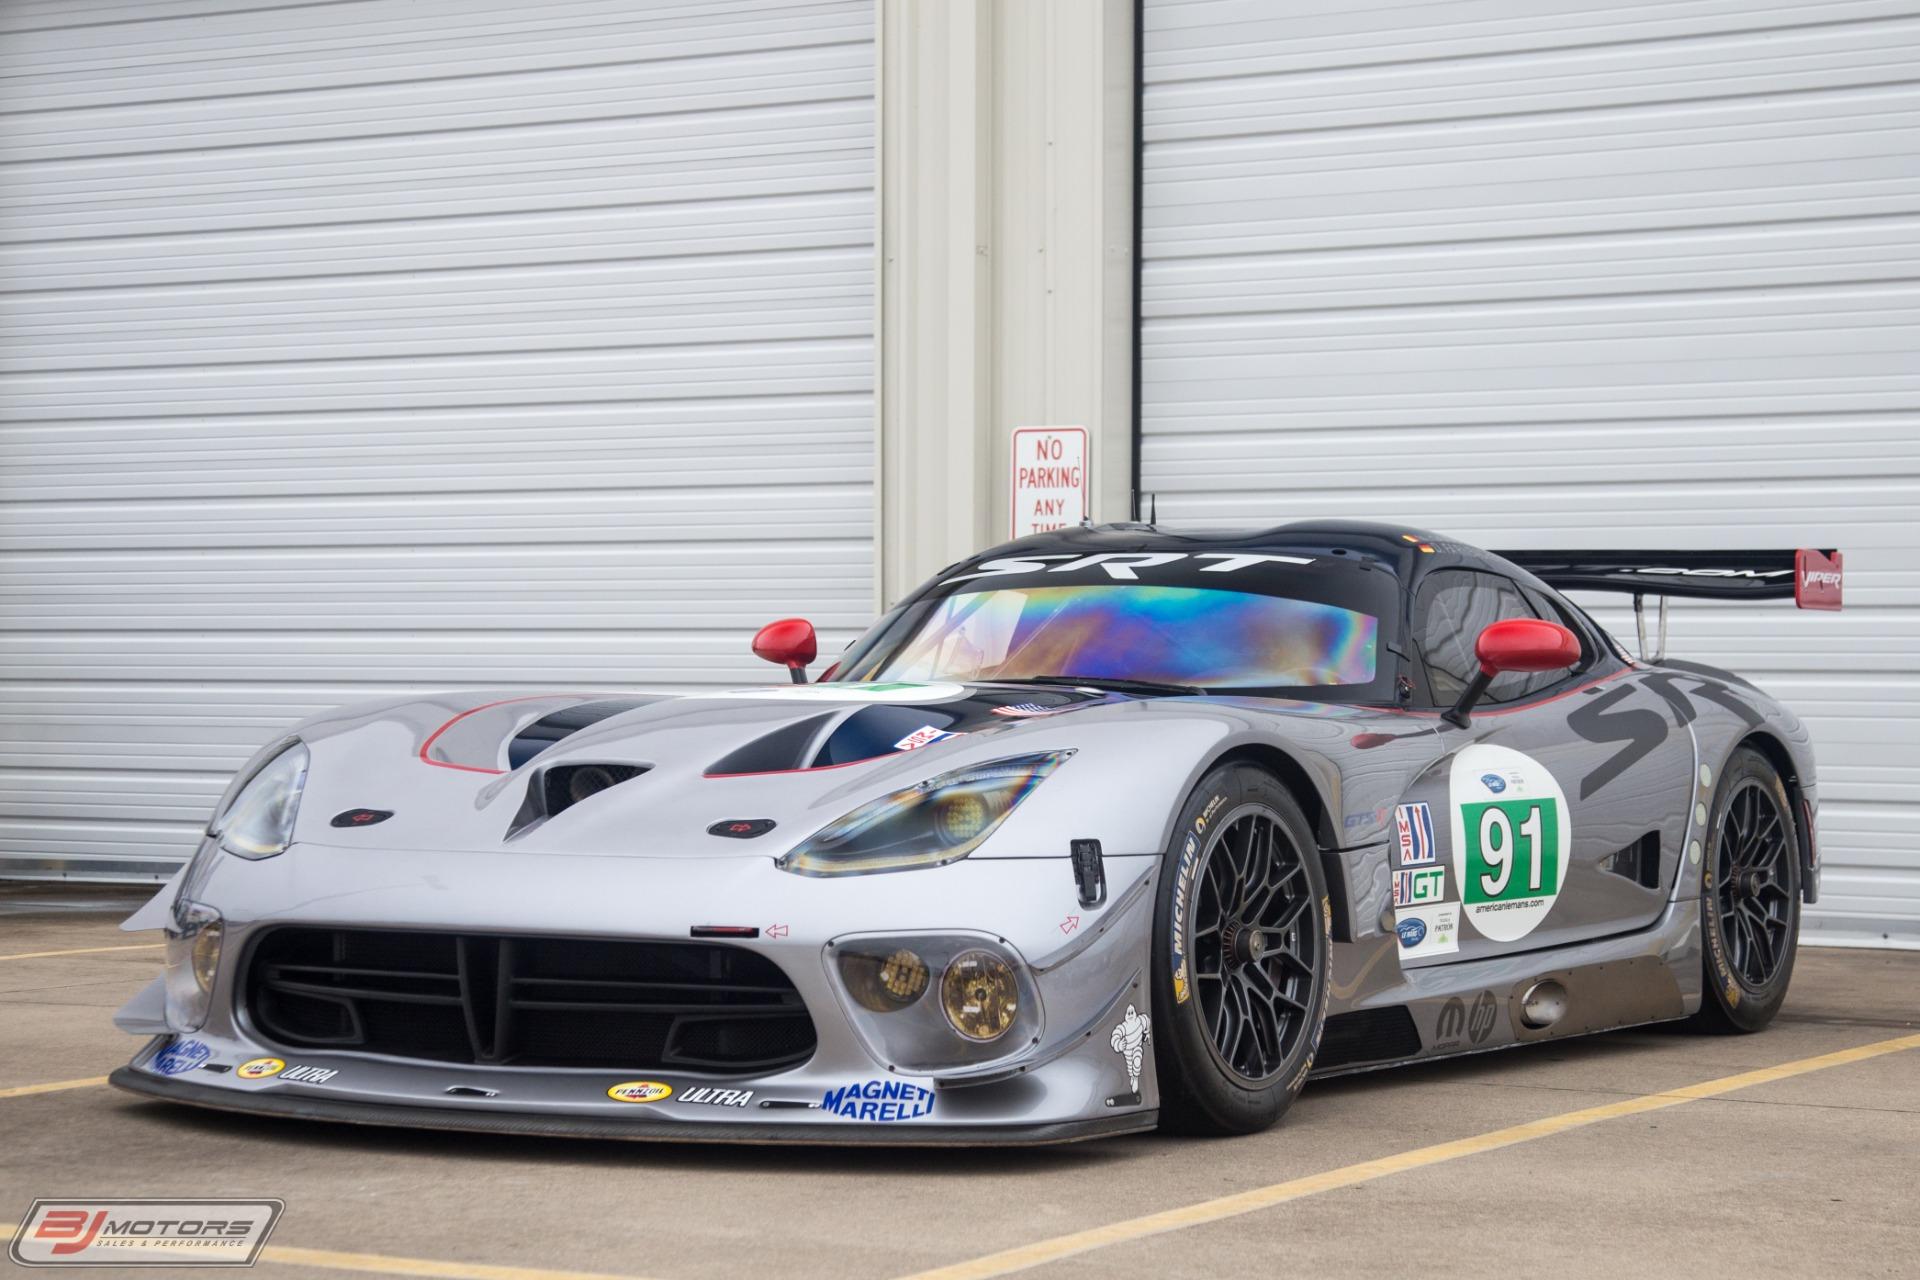 Used-2012-Dodge-Viper-GTS-R-Race-Car--91